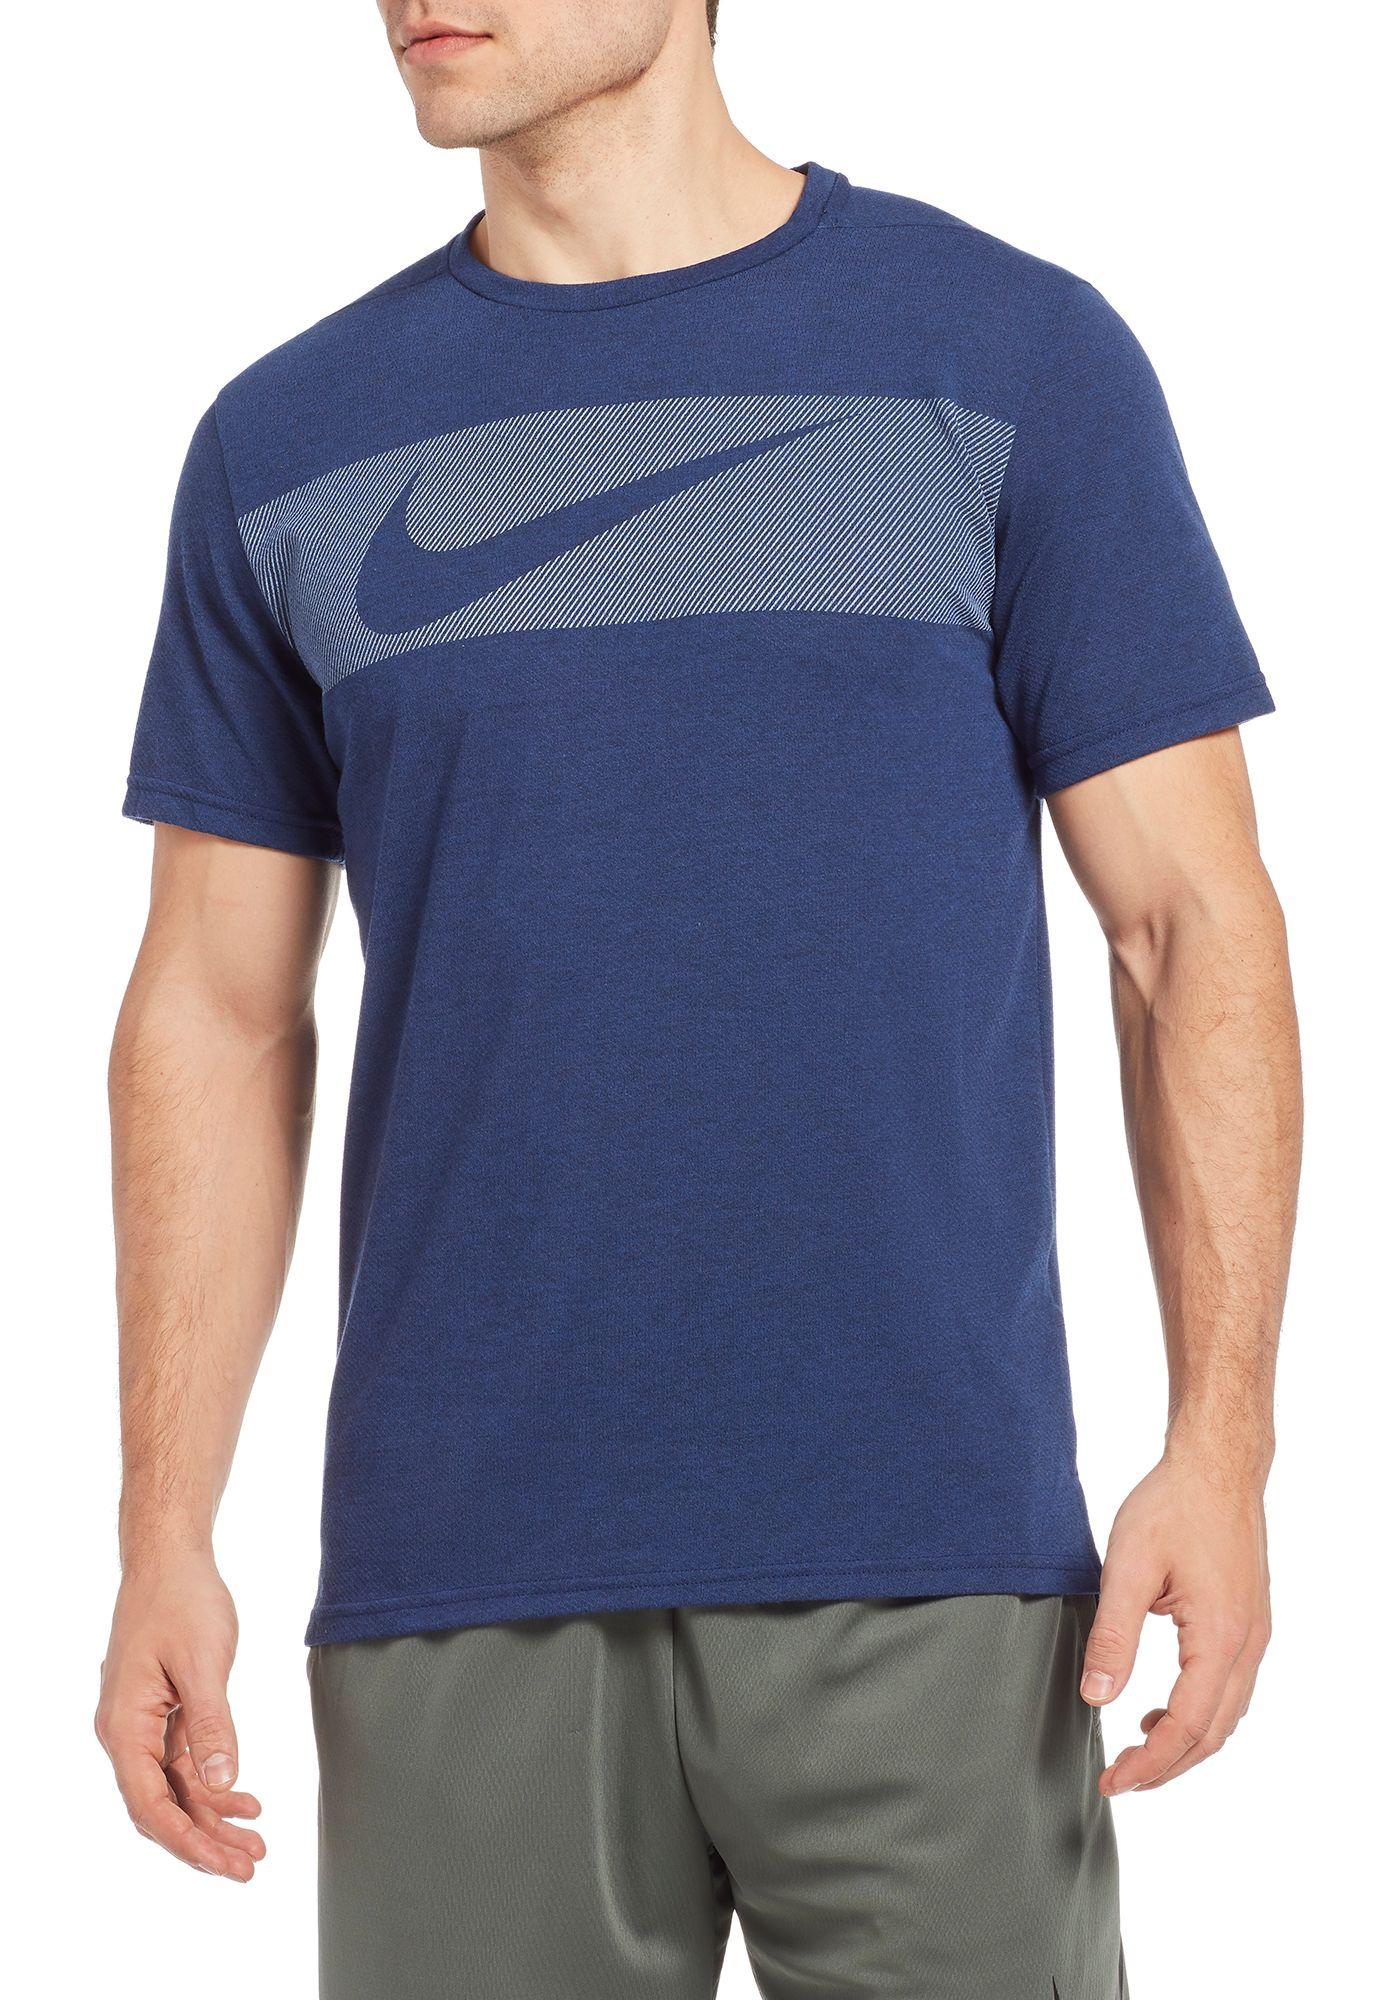 Nike Men's Hyper Dry Graphic Tee